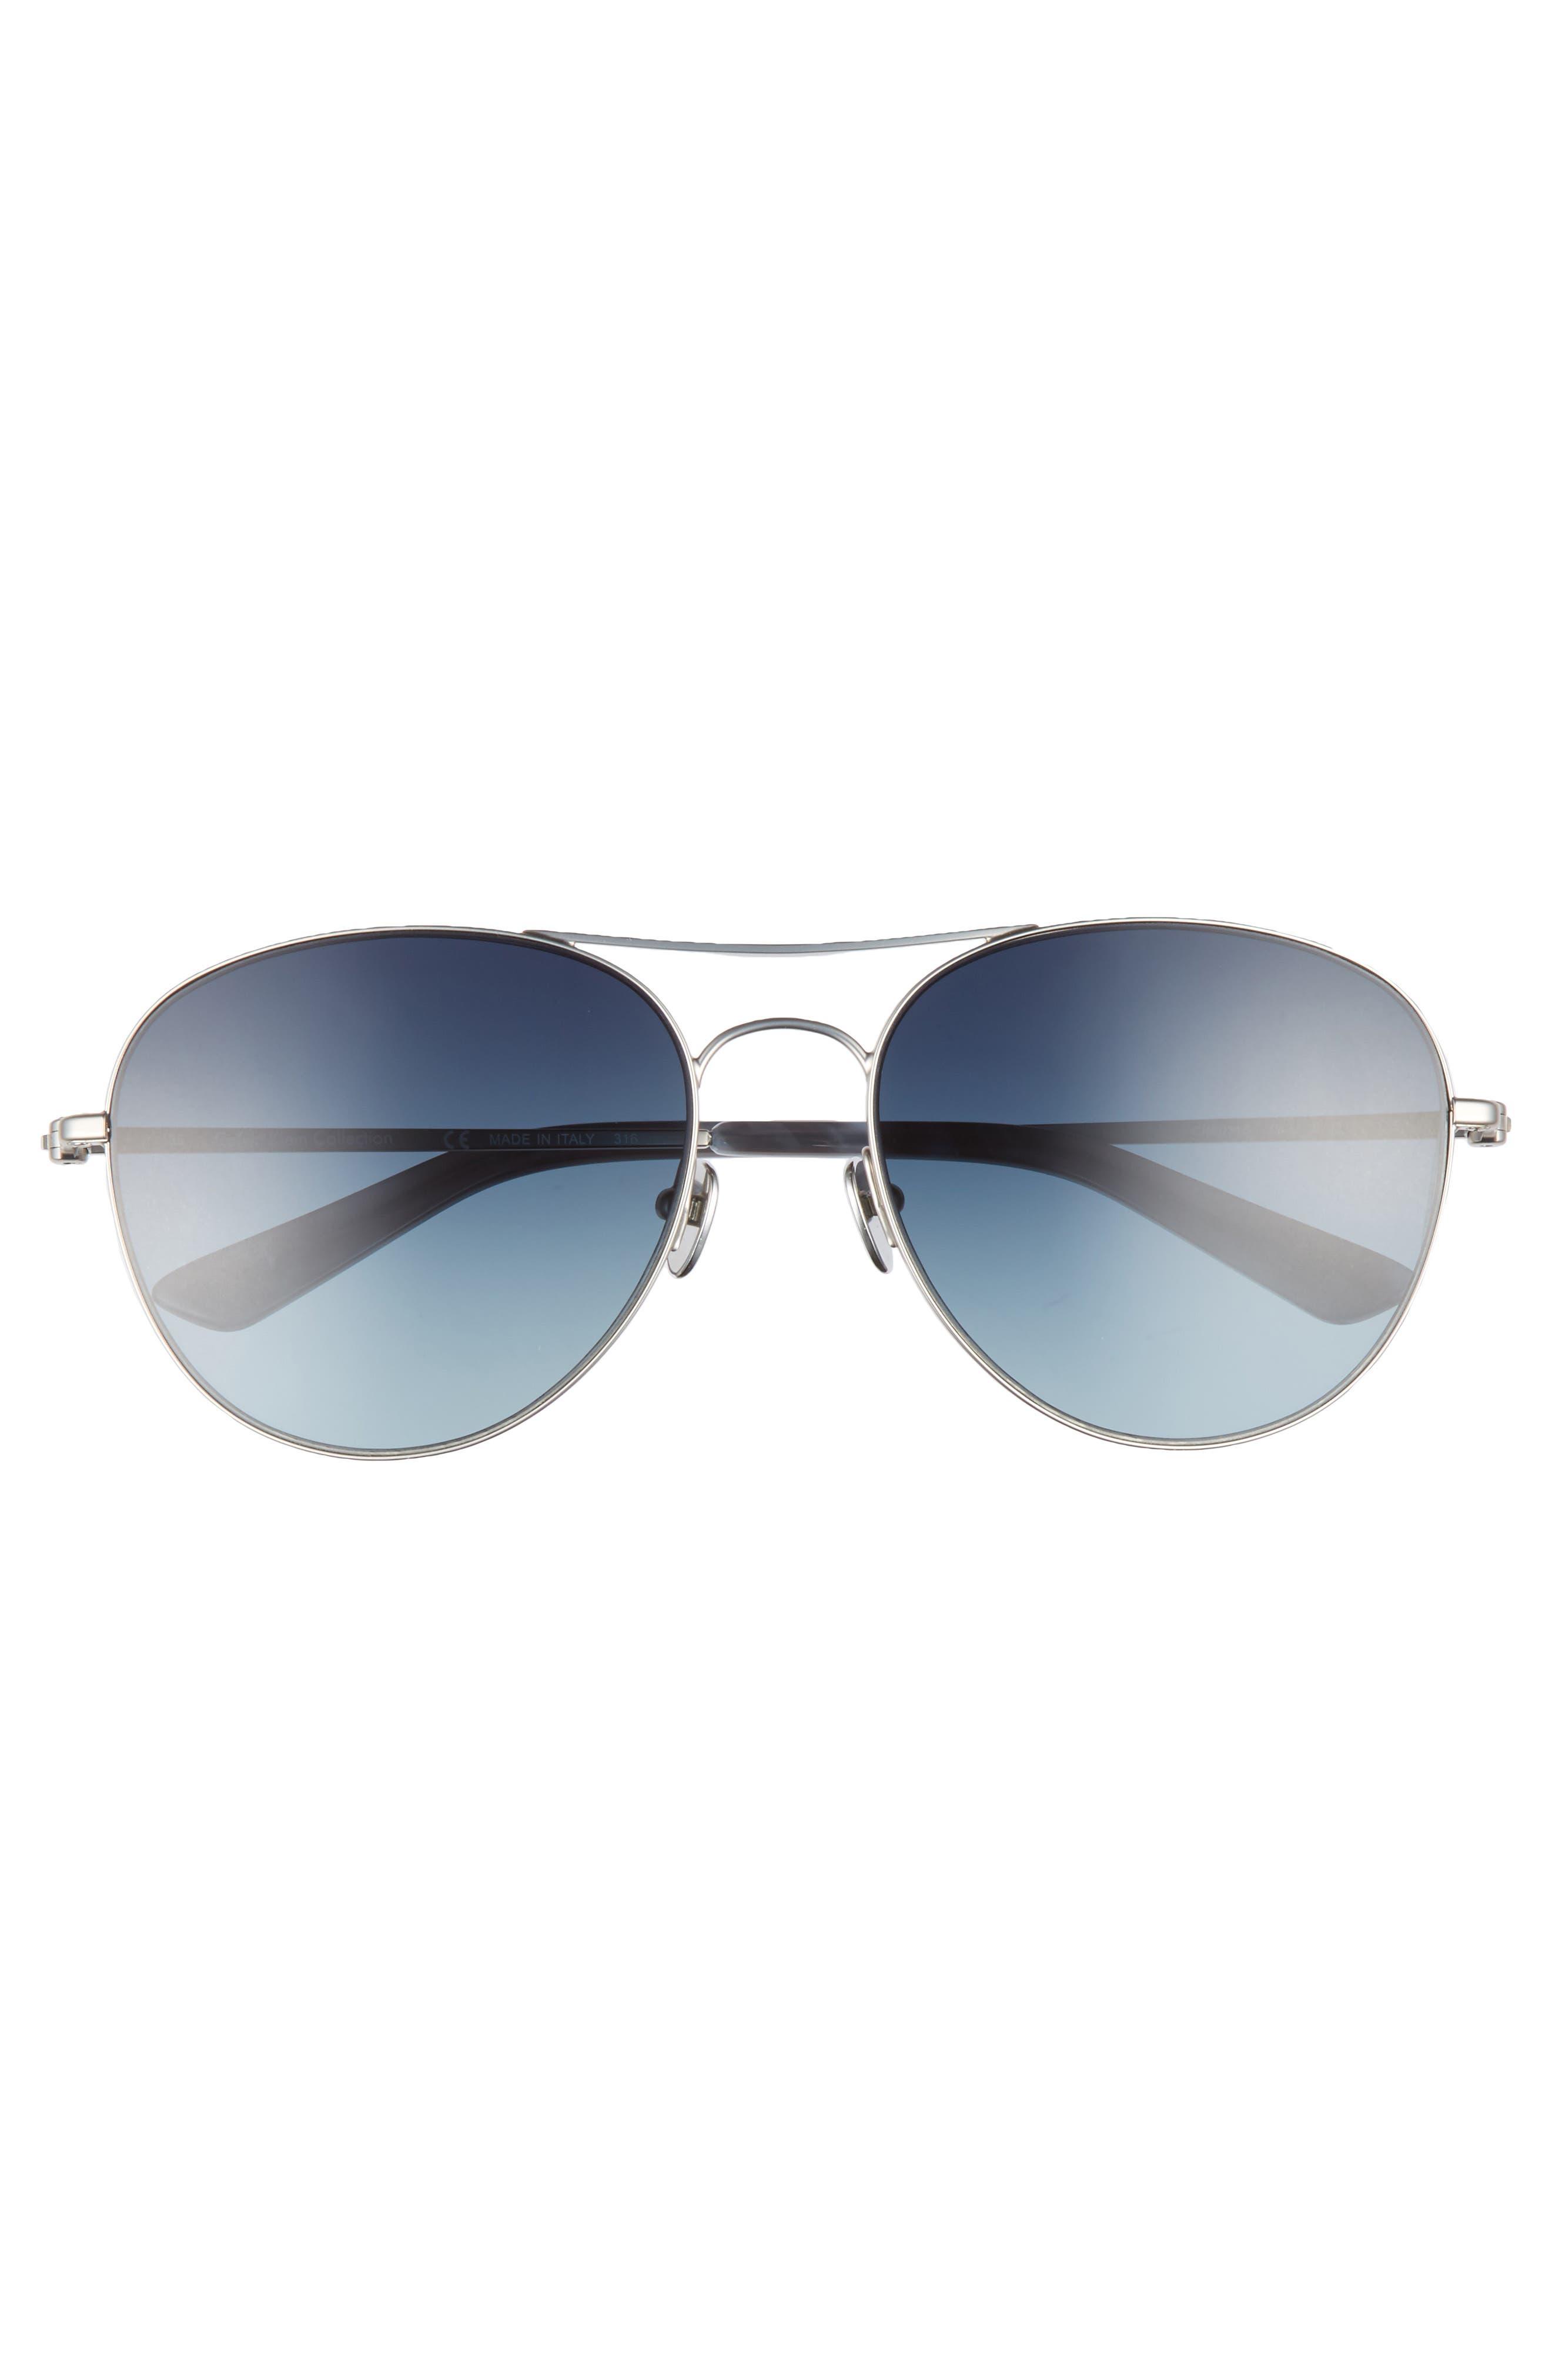 57mm Aviator Sunglasses,                             Alternate thumbnail 3, color,                             Satin Nickel